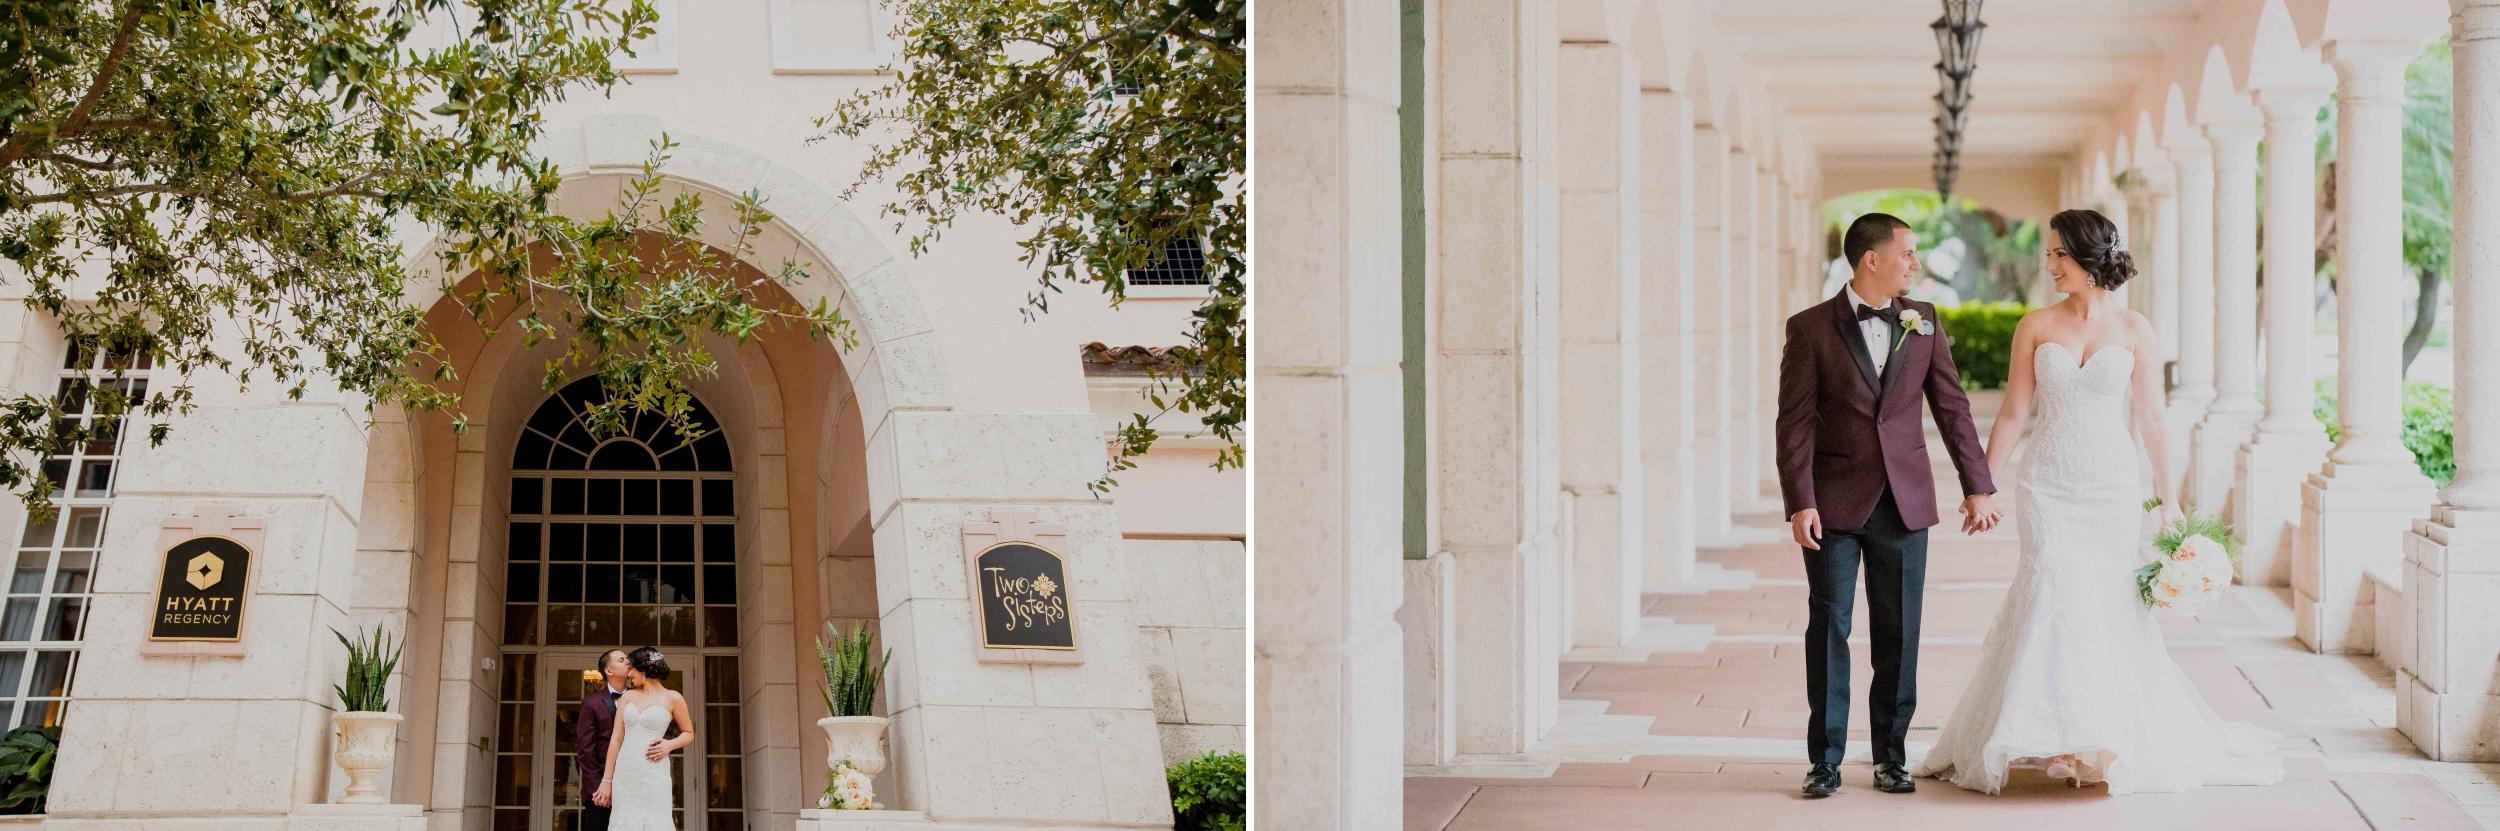 Wedding - Coco Plum - Coral Gables Congregational - Santy Martinez Photography 15.jpg